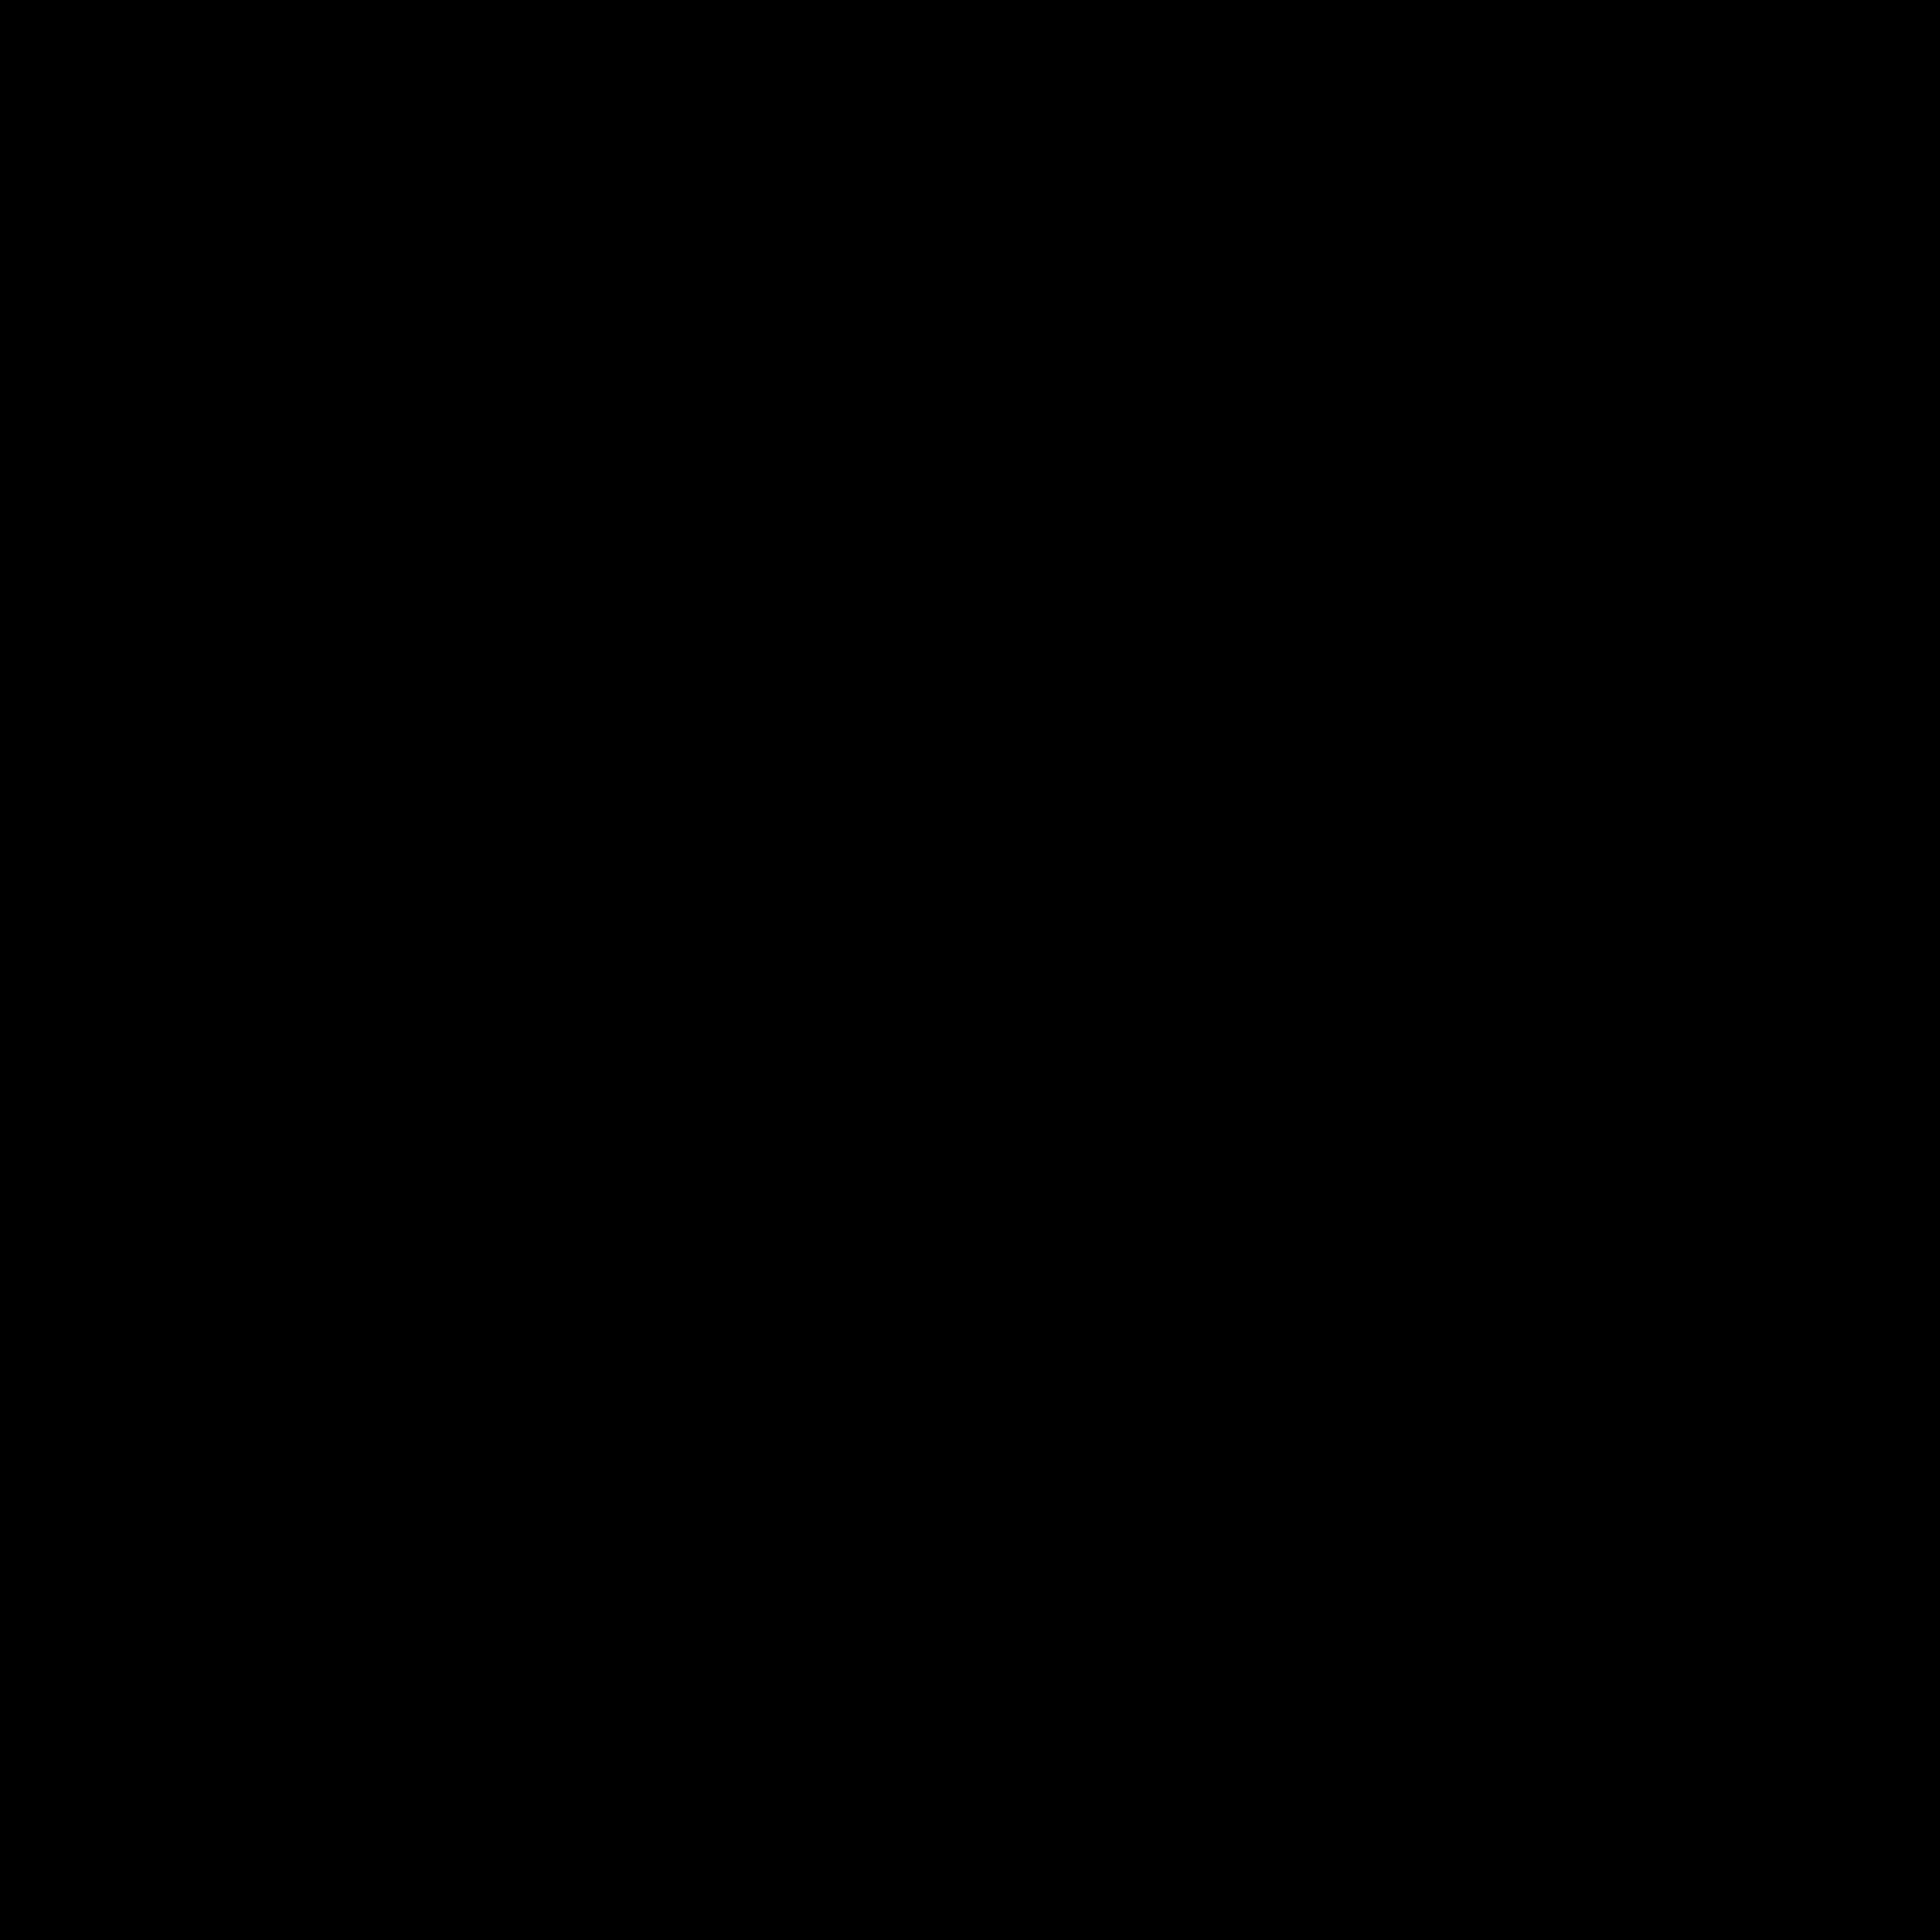 Leviton Logo PNG Transparent & SVG Vector - Freebie Supply